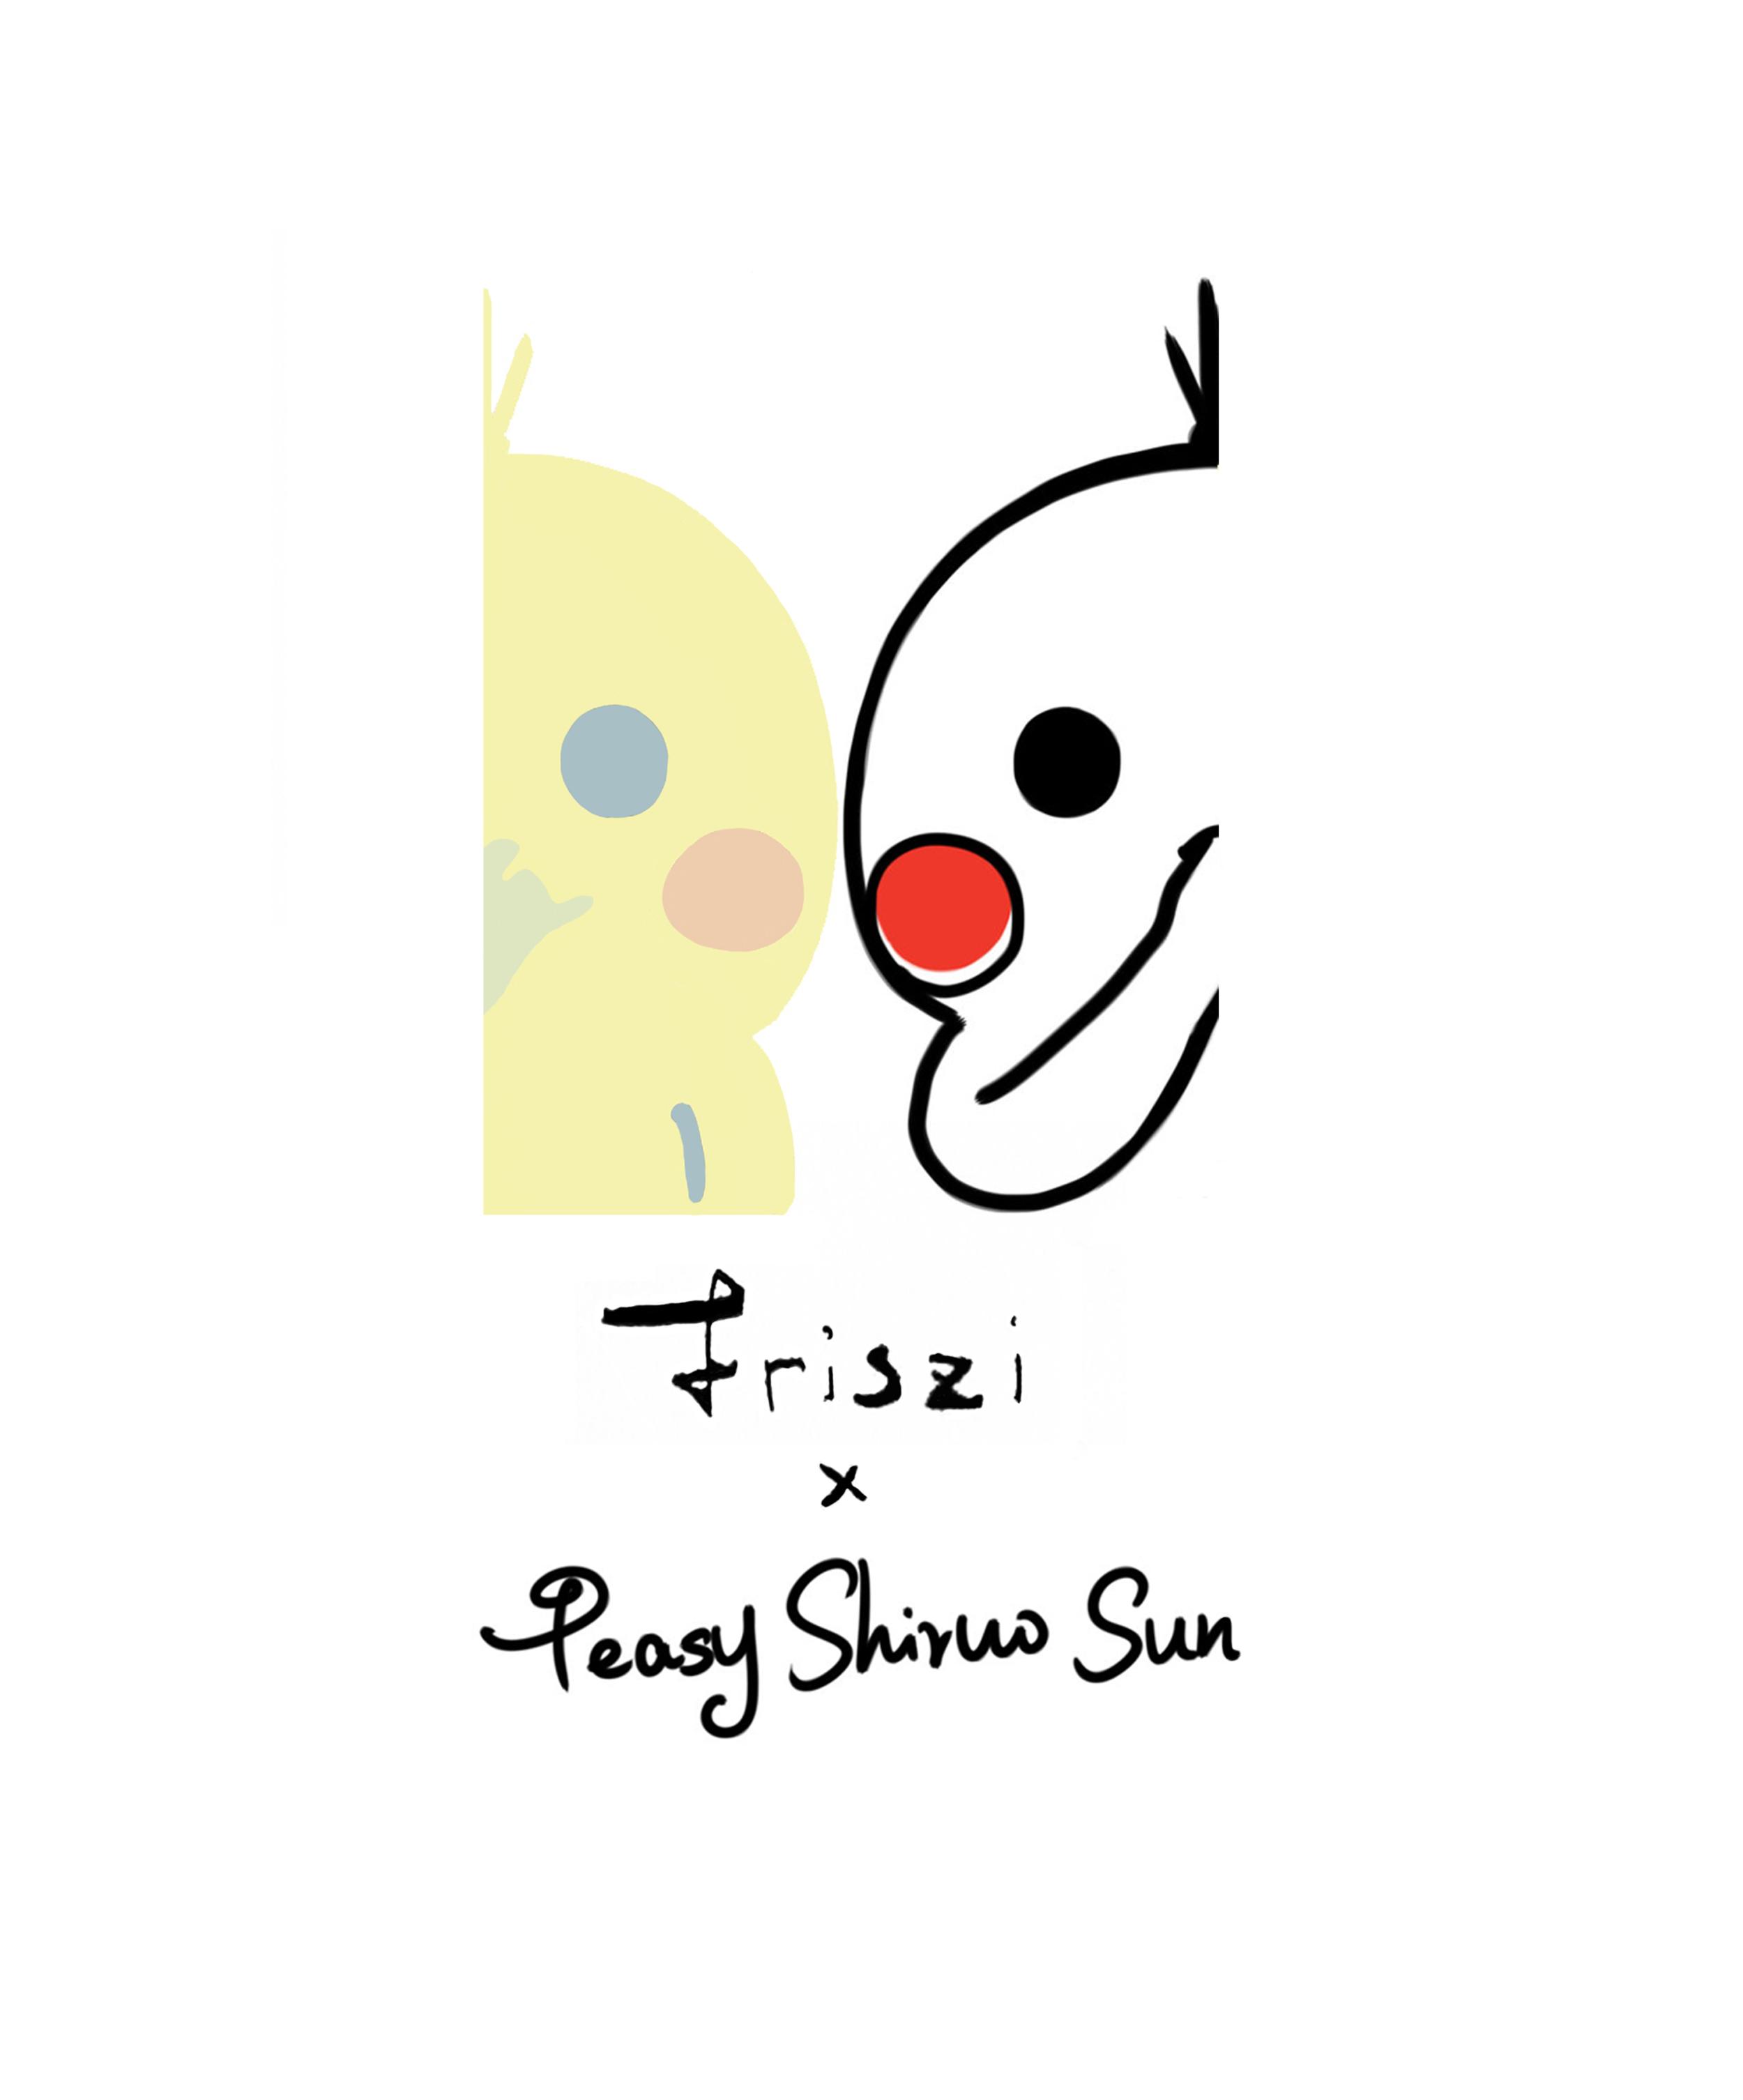 teasy and friszi logo